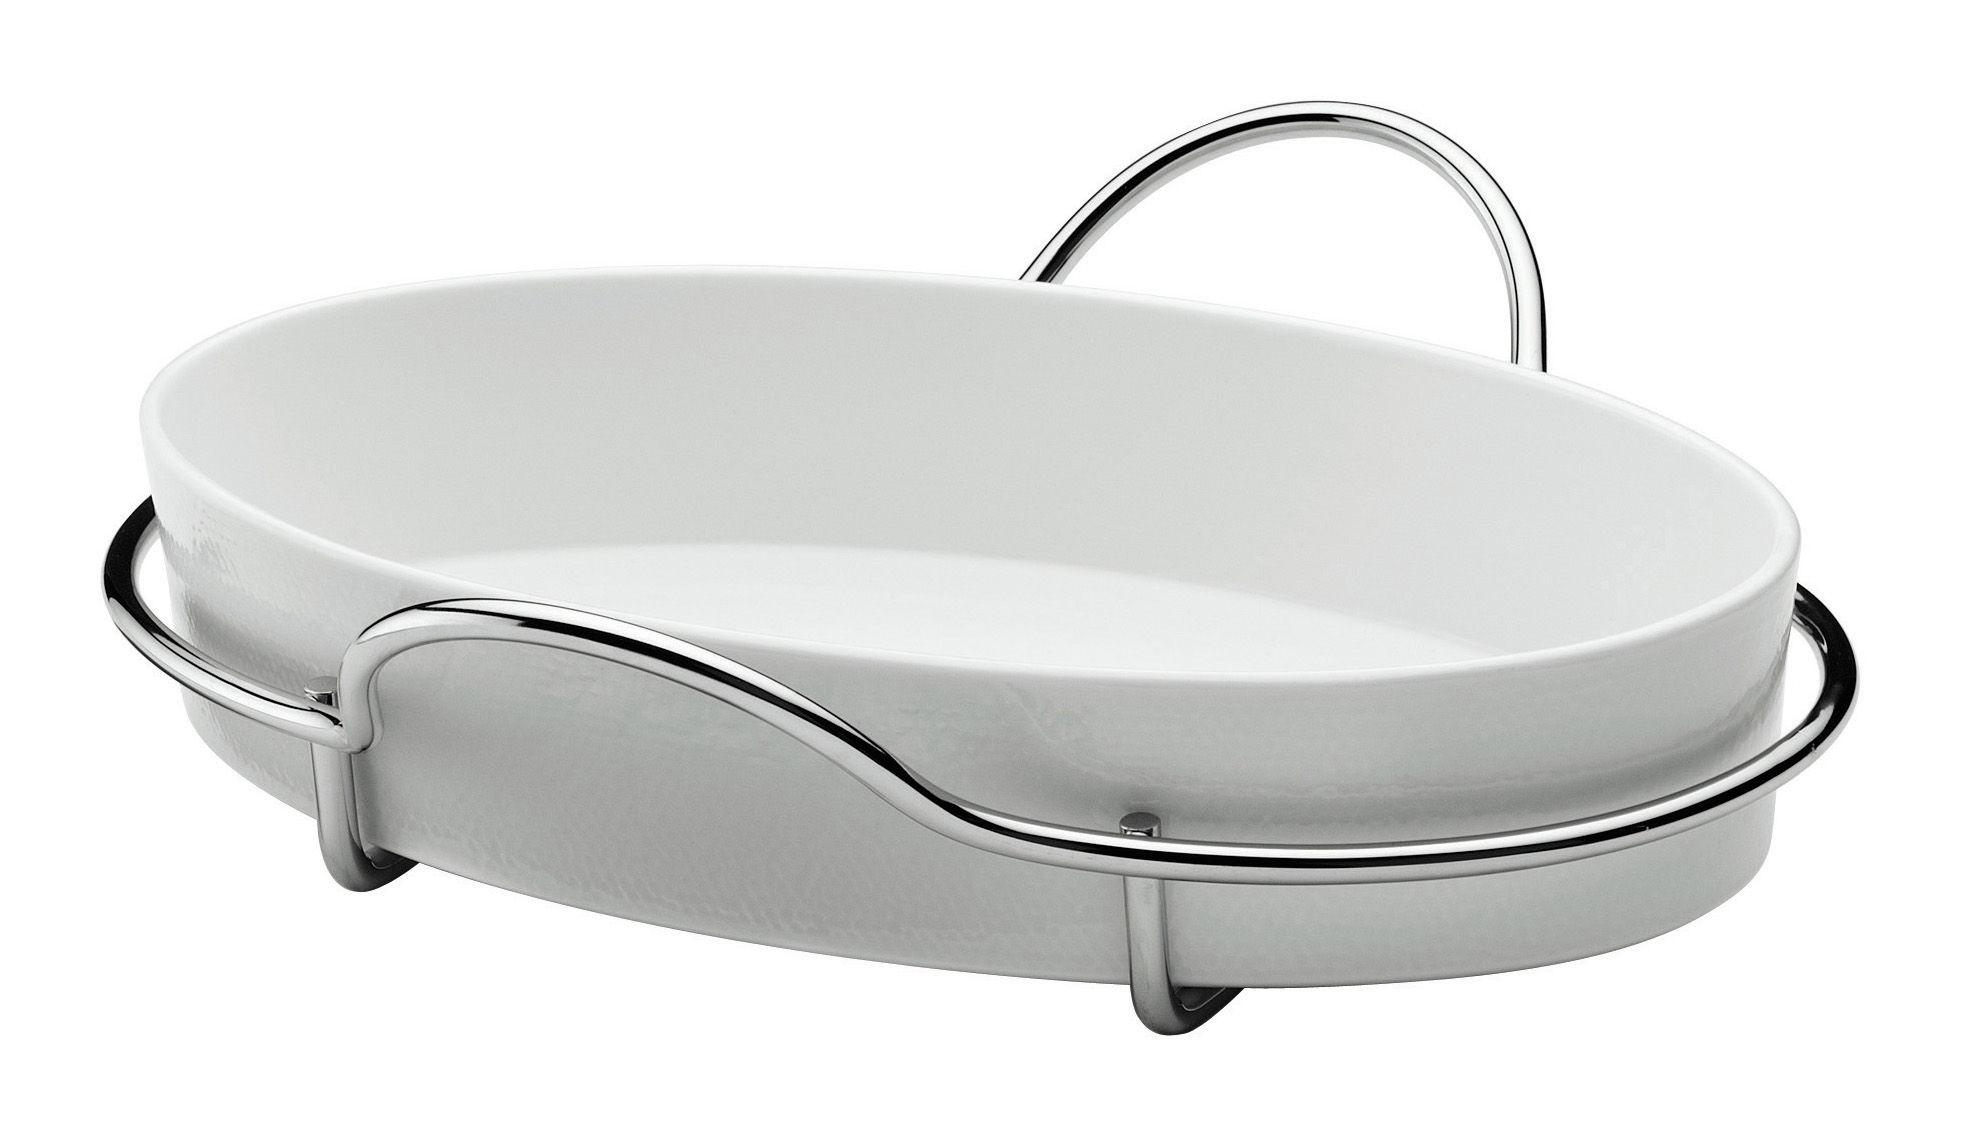 plat gratin al dente ovale plat ovale acier blanc serafino zani. Black Bedroom Furniture Sets. Home Design Ideas